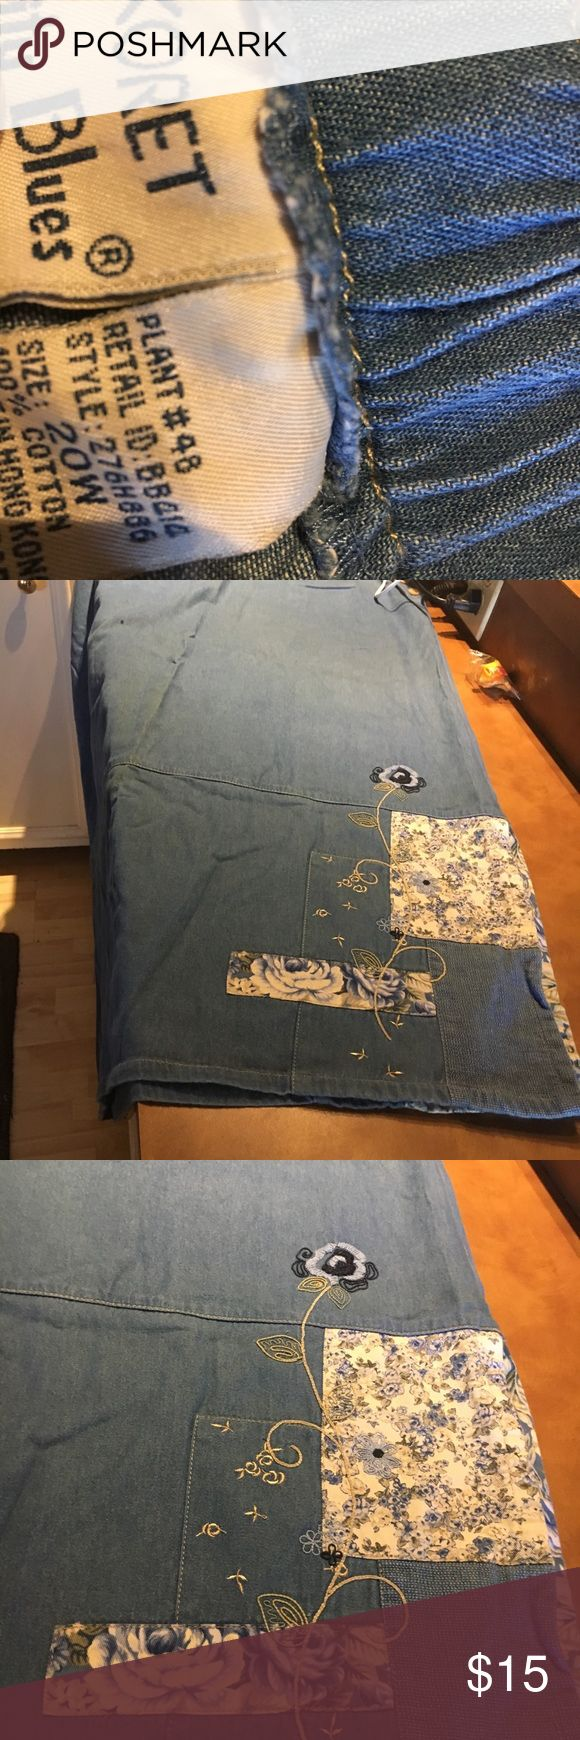 Koret ladies denim plus size skirt Unique denim skirt beautiful details to this size 20w skirt Koret Skirts Maxi